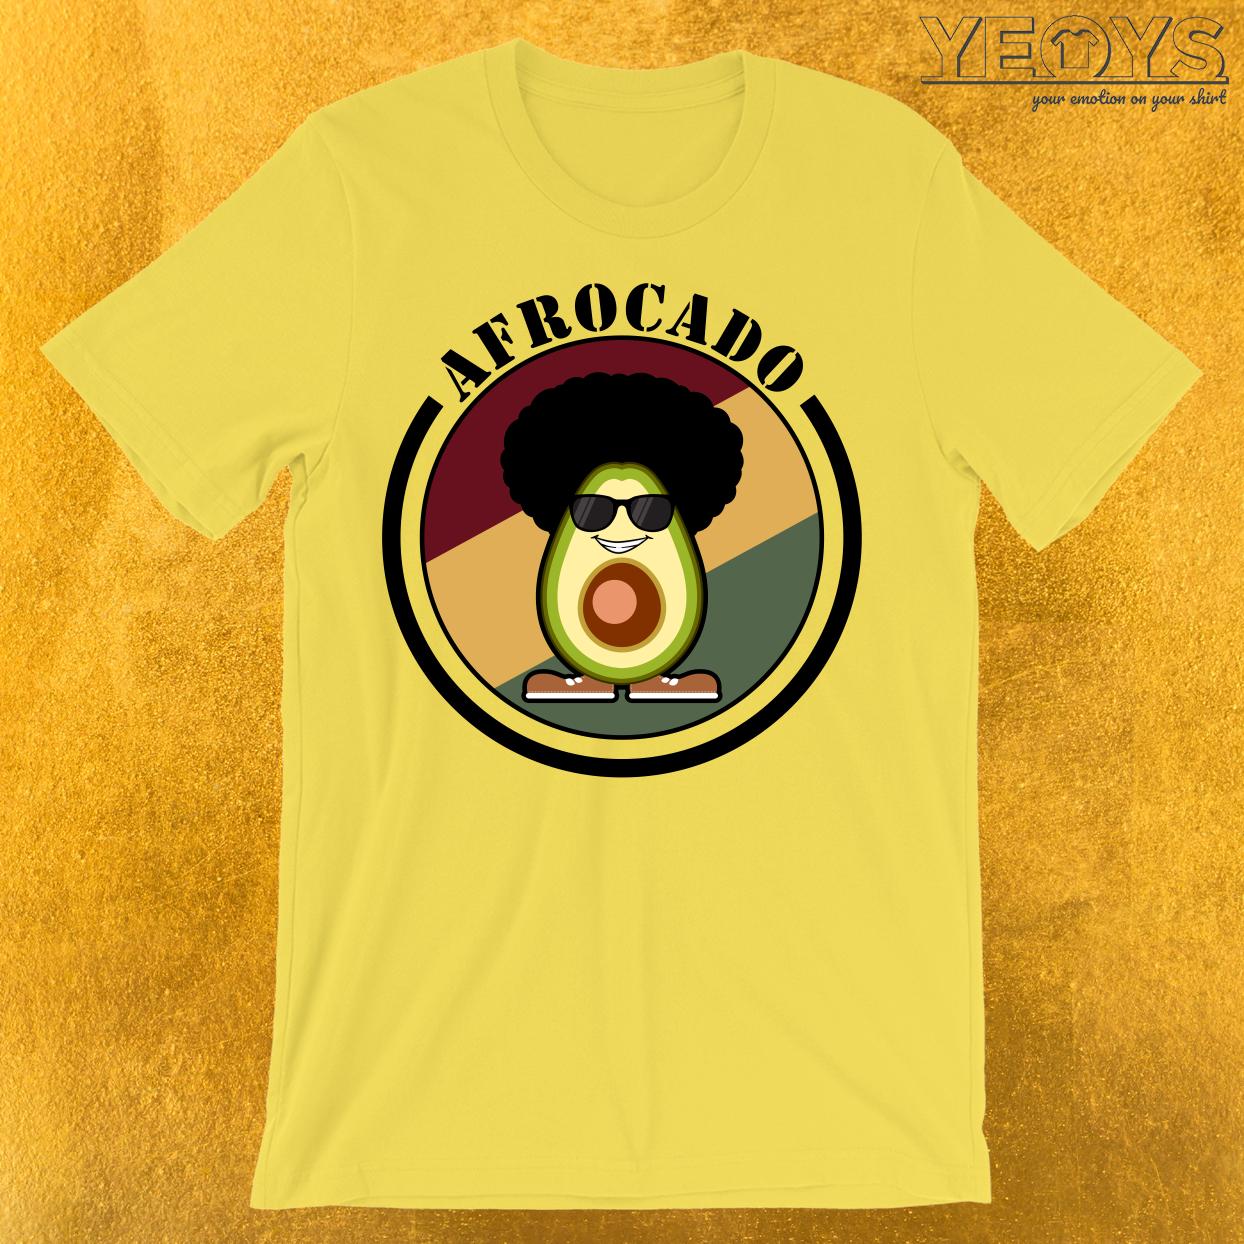 Afrocado Funny Avocado Pun T-Shirt